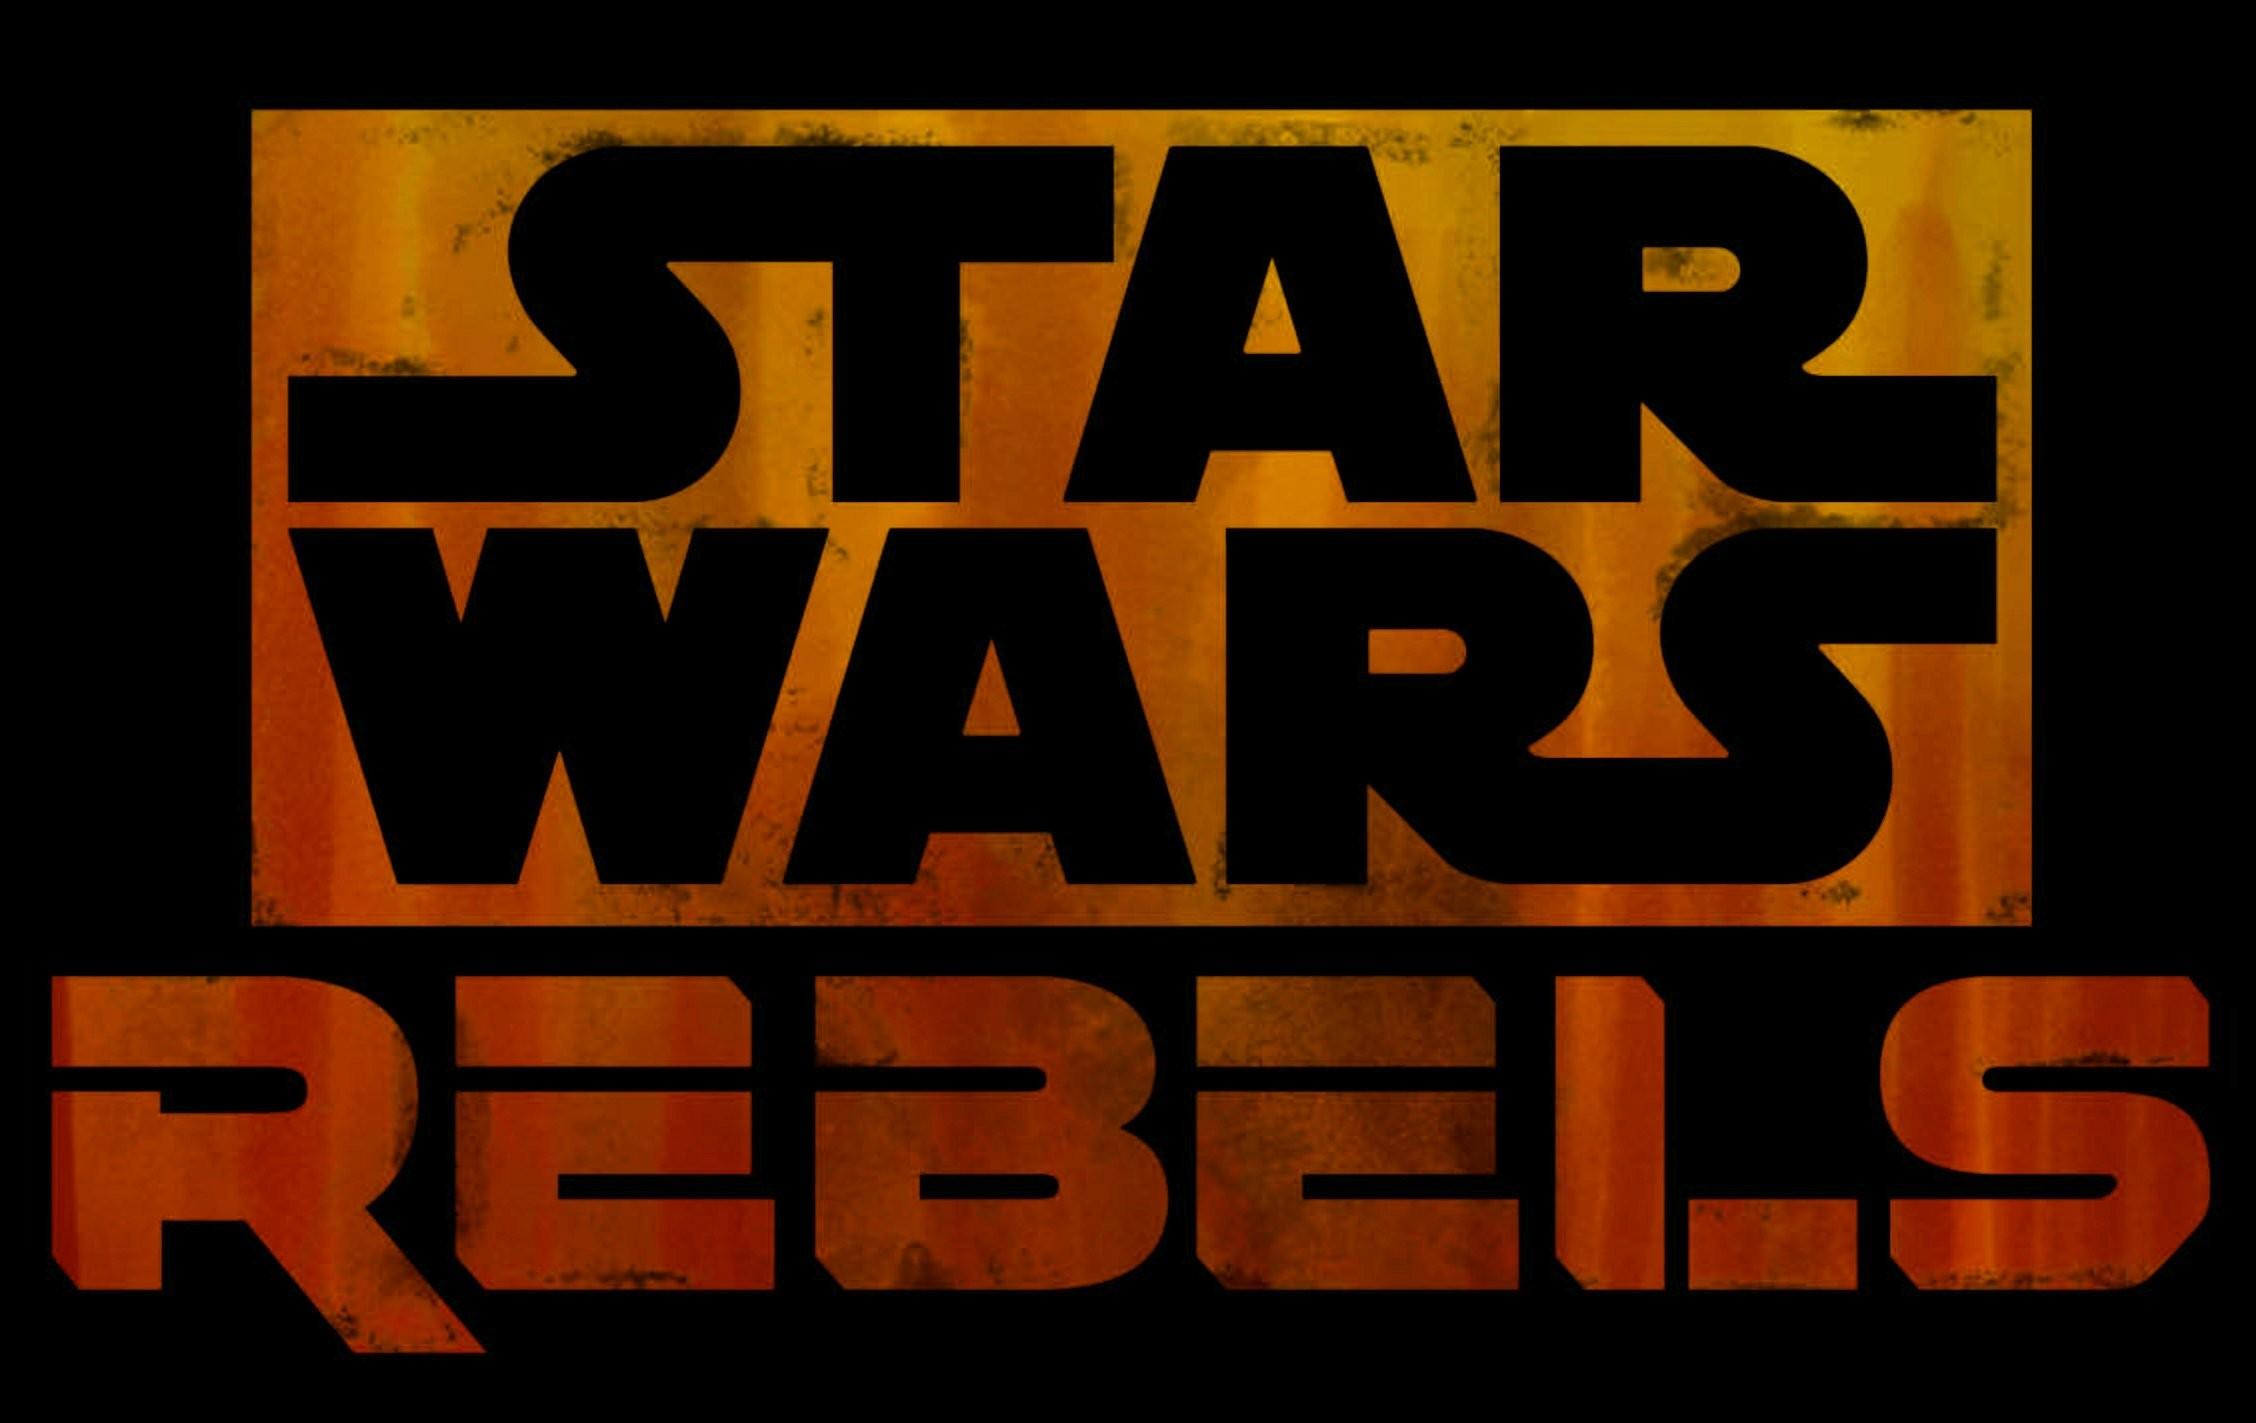 STAR WARS REBELS animated series sci-fi disney action adventure wallpaper |  | 533627 | WallpaperUP